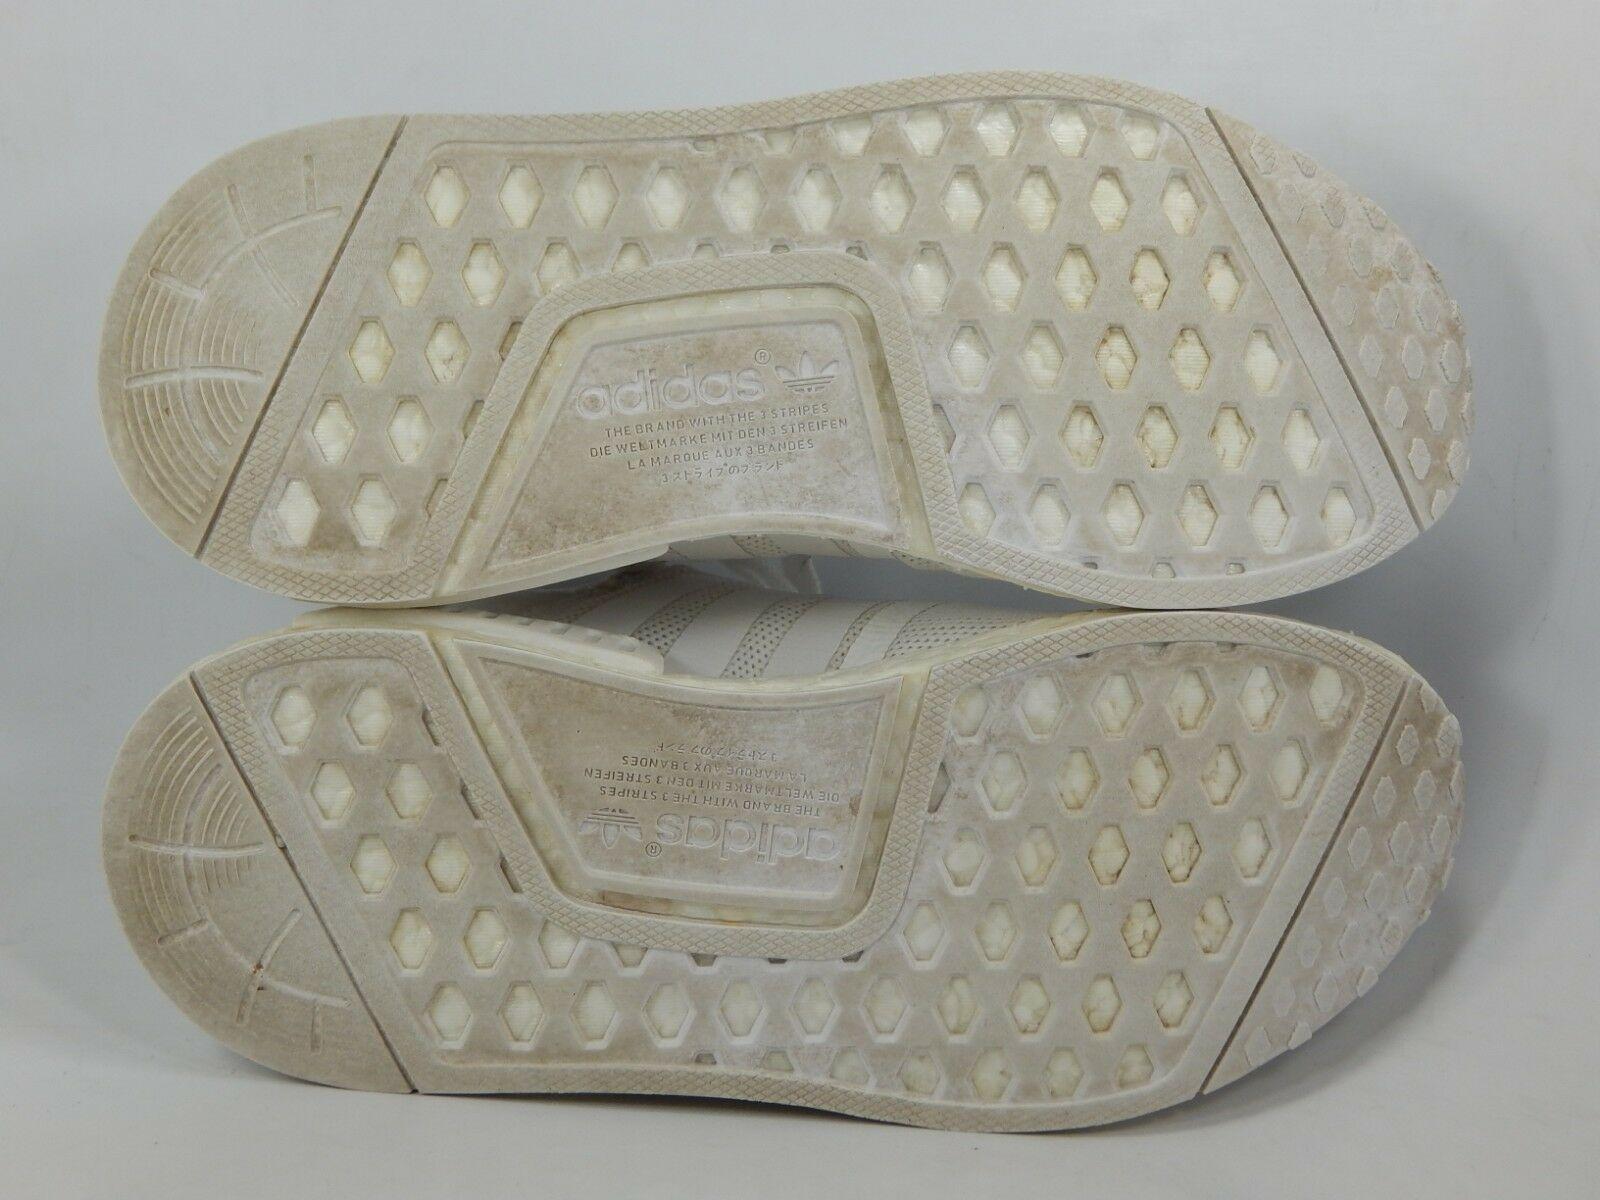 Adidas NMD R1 Triple White Size 5 M (Y) EU 37 1/3 Youth Running Shoes BA7245